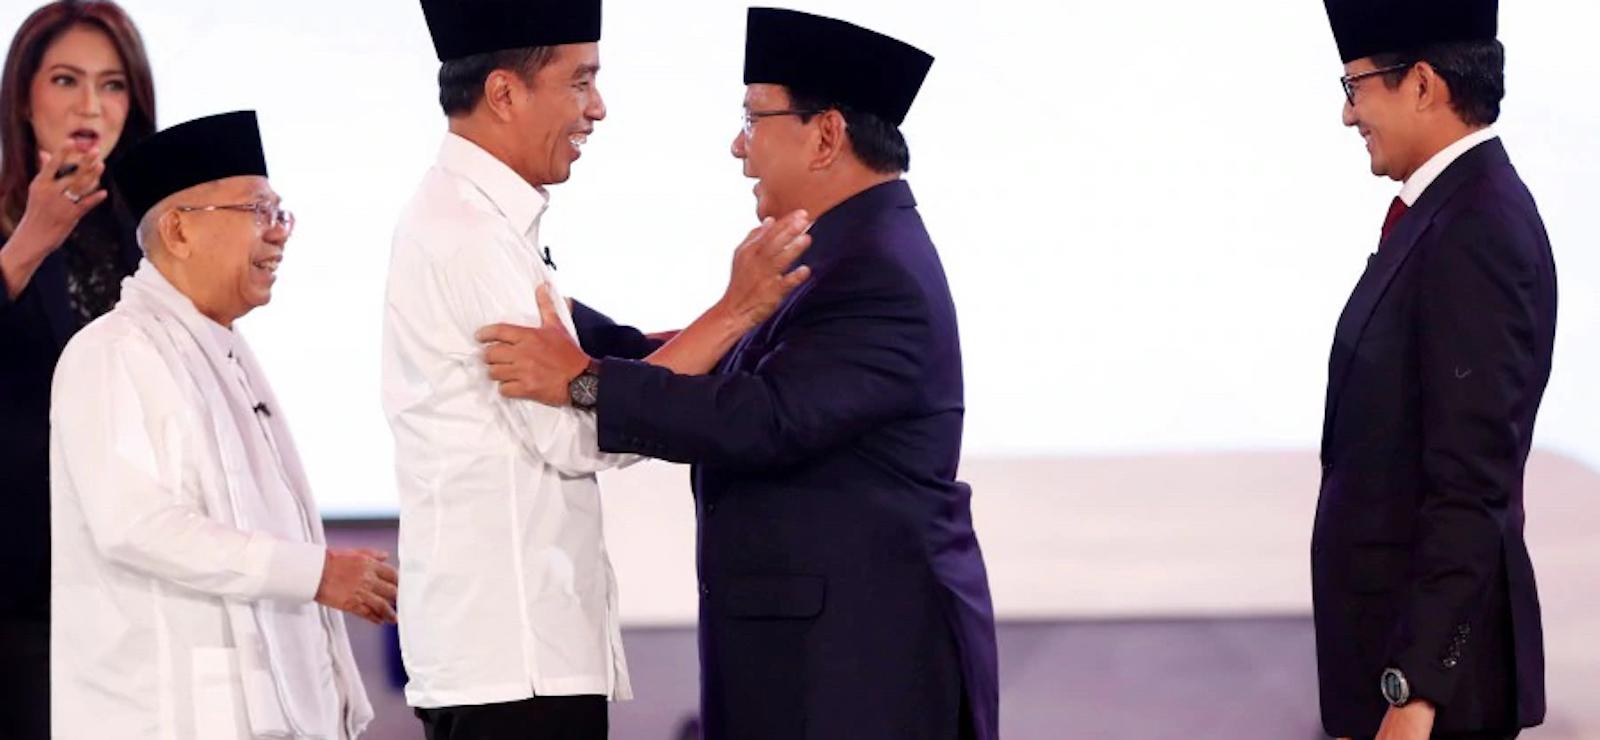 Indonesian President Joko Widodo and Prabowo Subianto (Photo: Gadek/ Flickr)